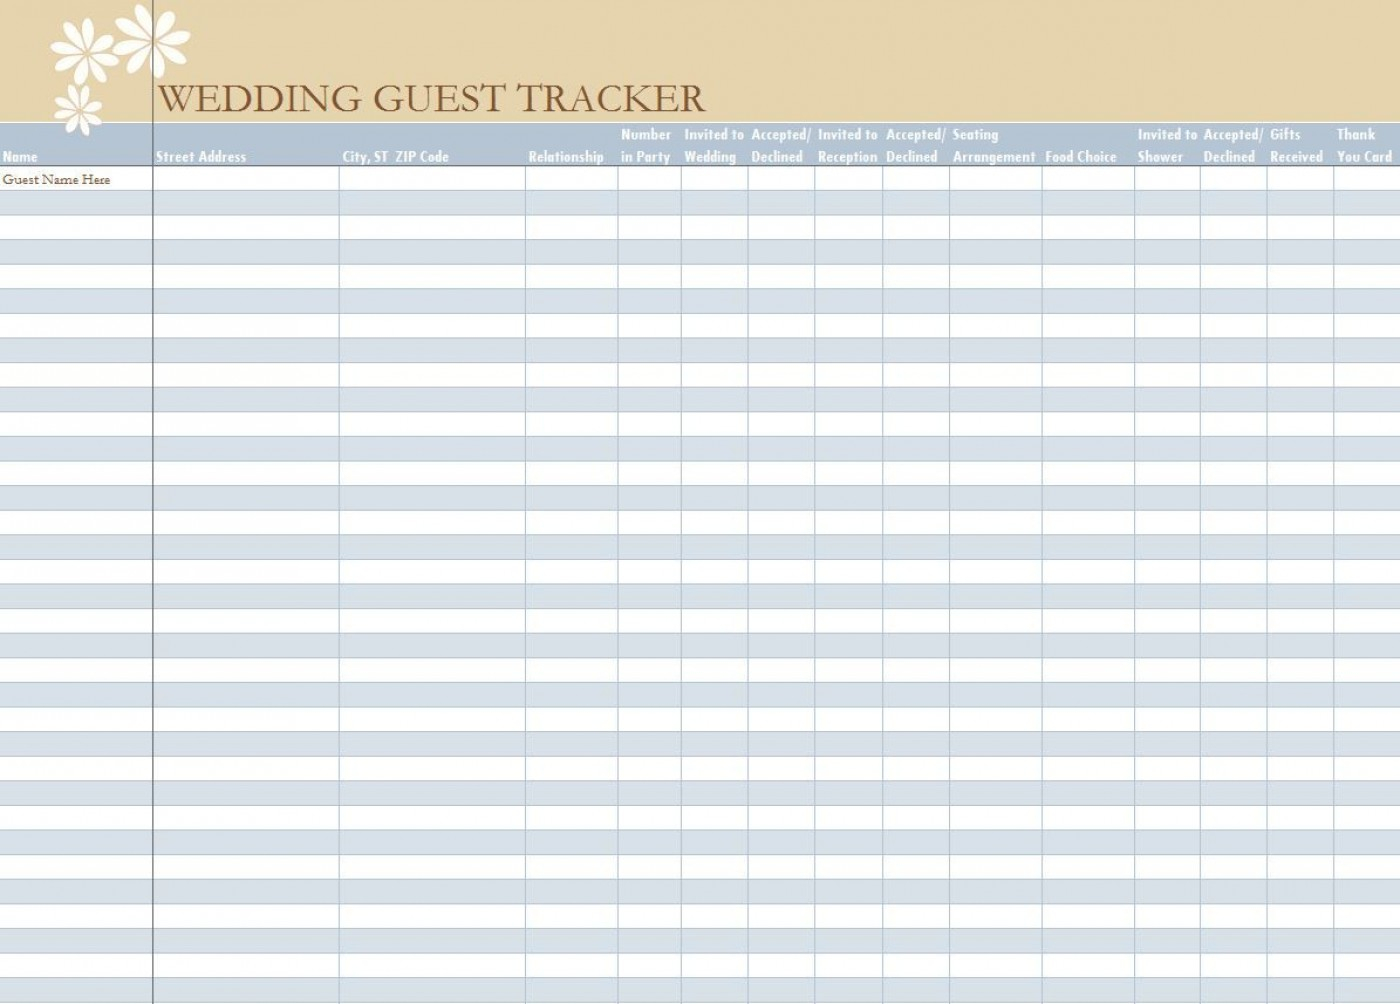 006 Unbelievable Wedding Guest List Excel Spreadsheet Template Picture 1400